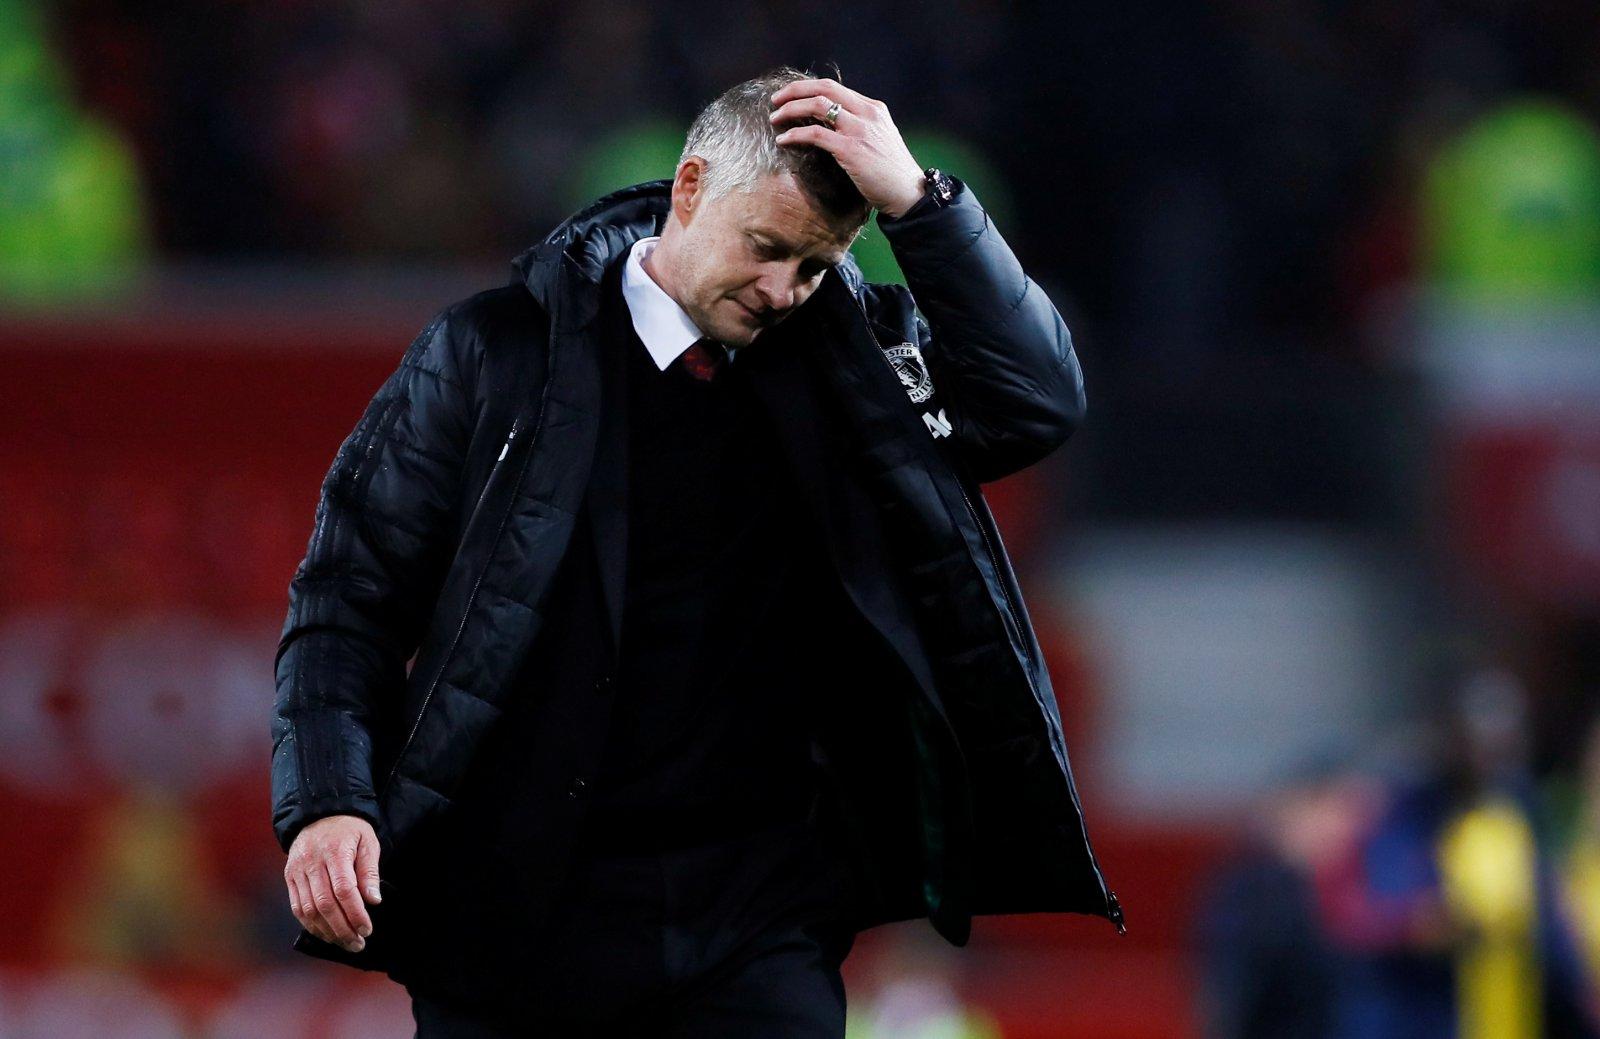 Man United manager Ole Gunnar Solksjkaer